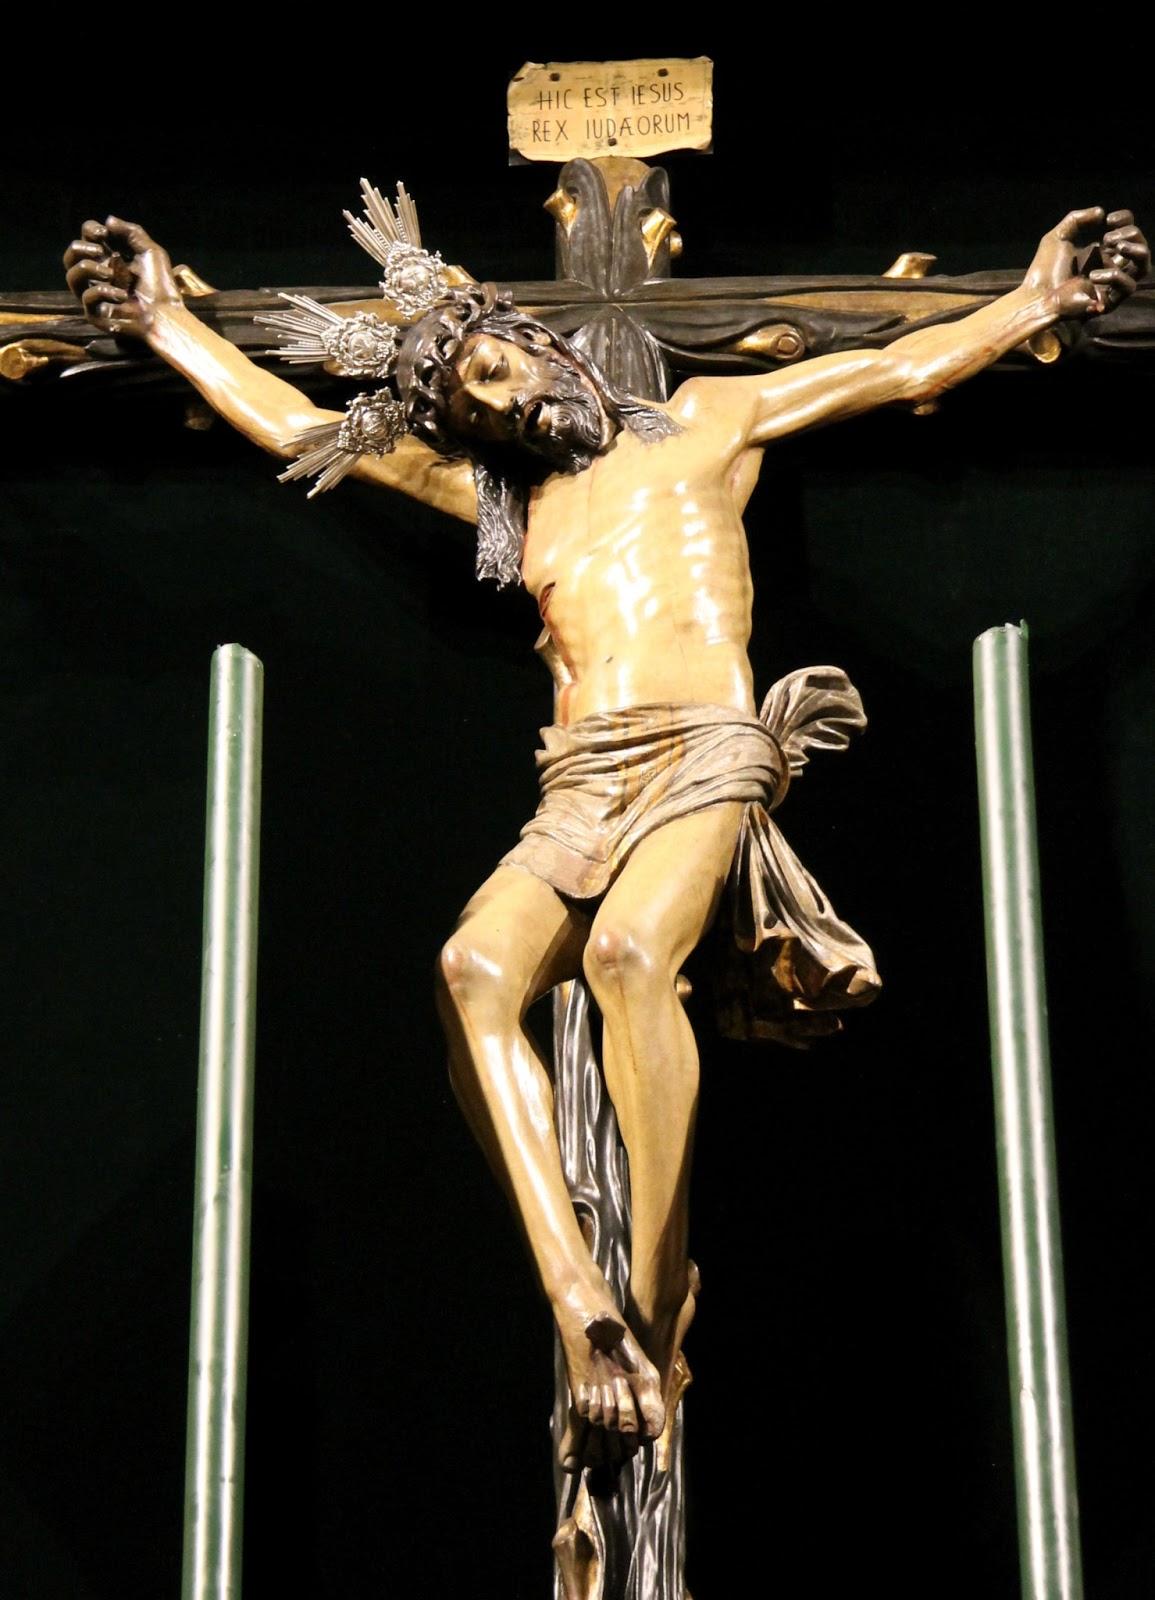 http://2.bp.blogspot.com/-9uPCMiIdo24/USyURcWs7fI/AAAAAAAATcQ/Q9PTA61tmVY/s1600/Cristo+de+la+Vera+Cruz+(Sevilla)+(6).jpg